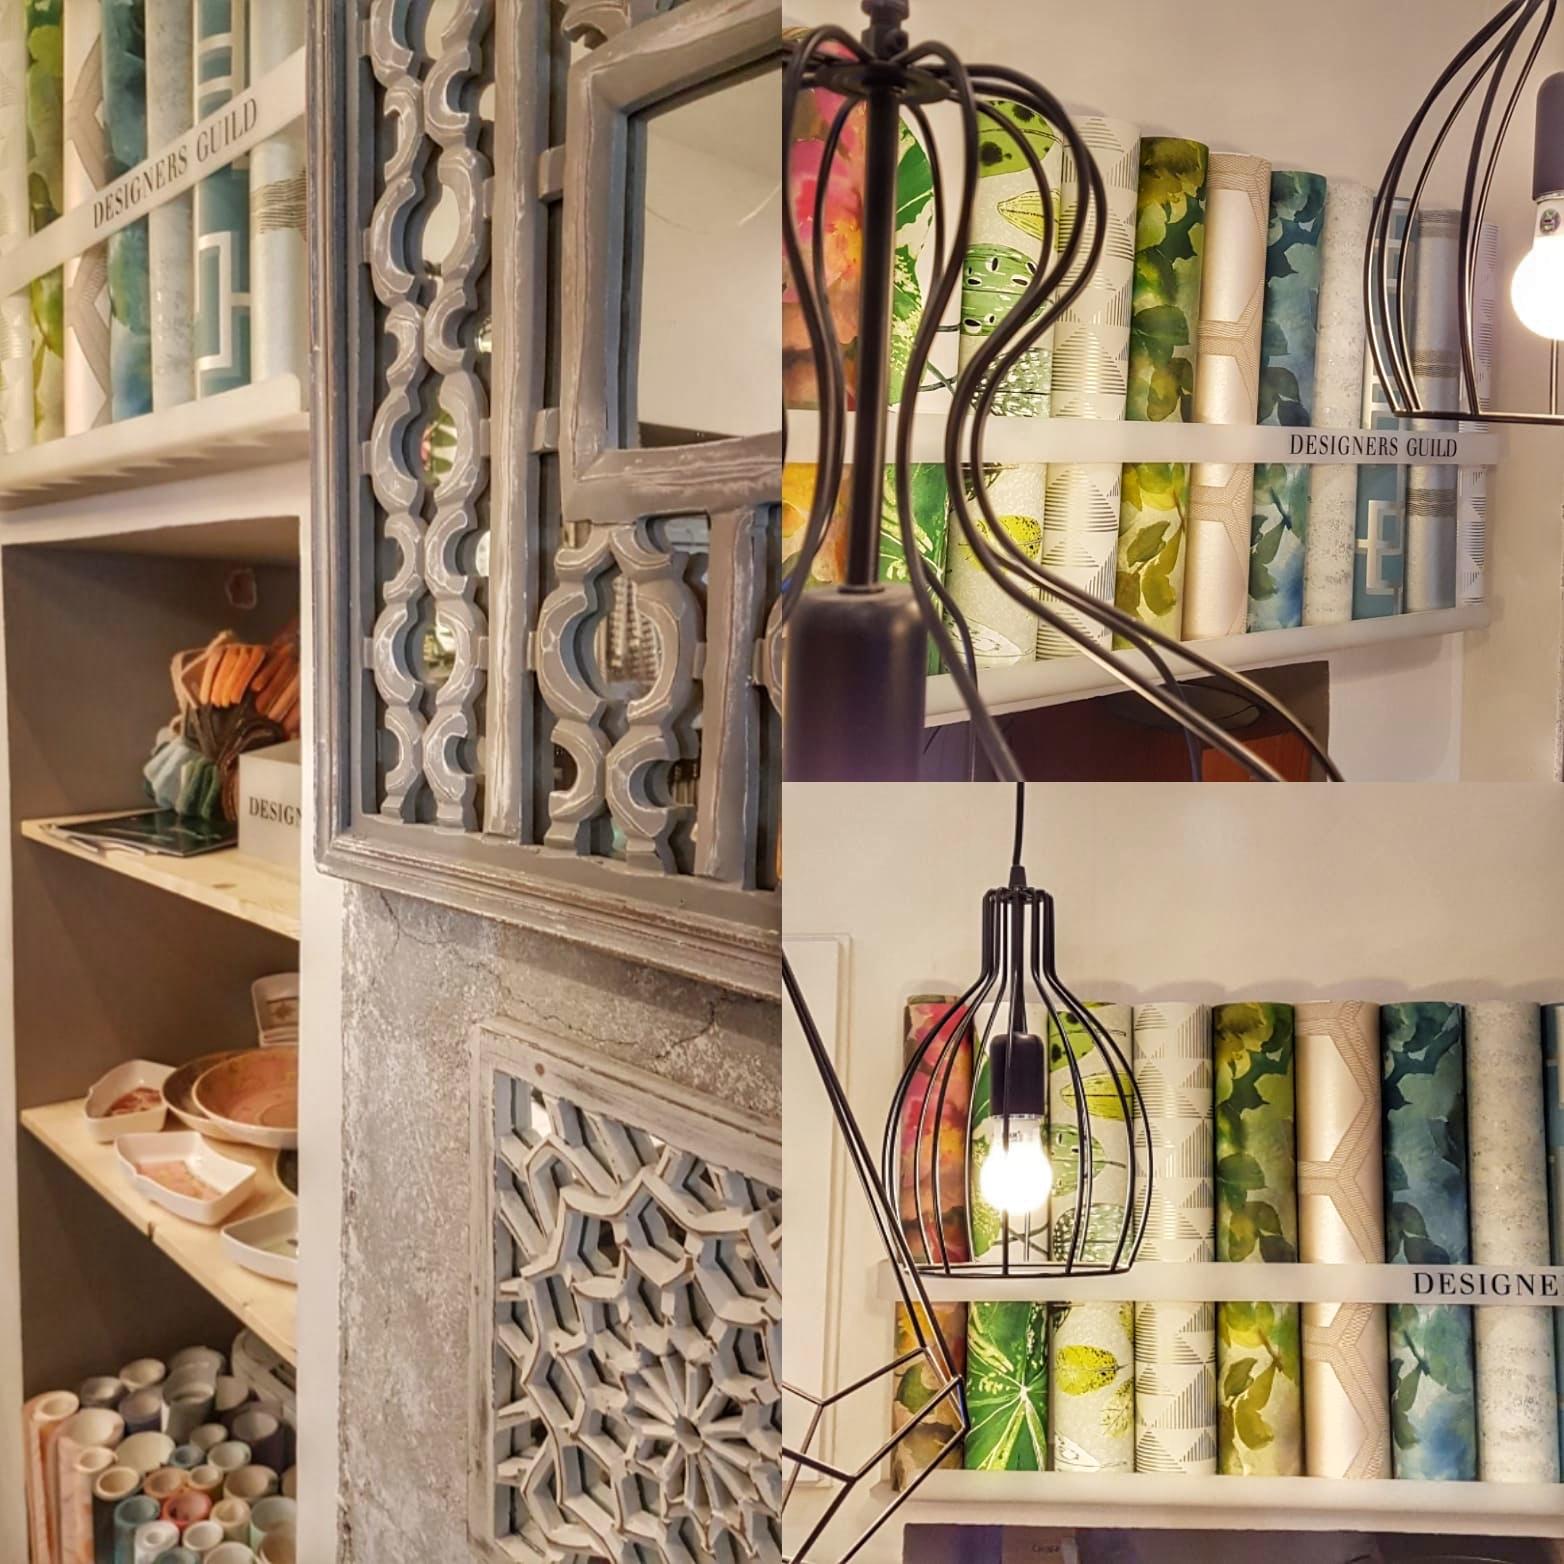 sara-rombola-pink-house-arredatrice-interior-designer-torino-talentieventi-13